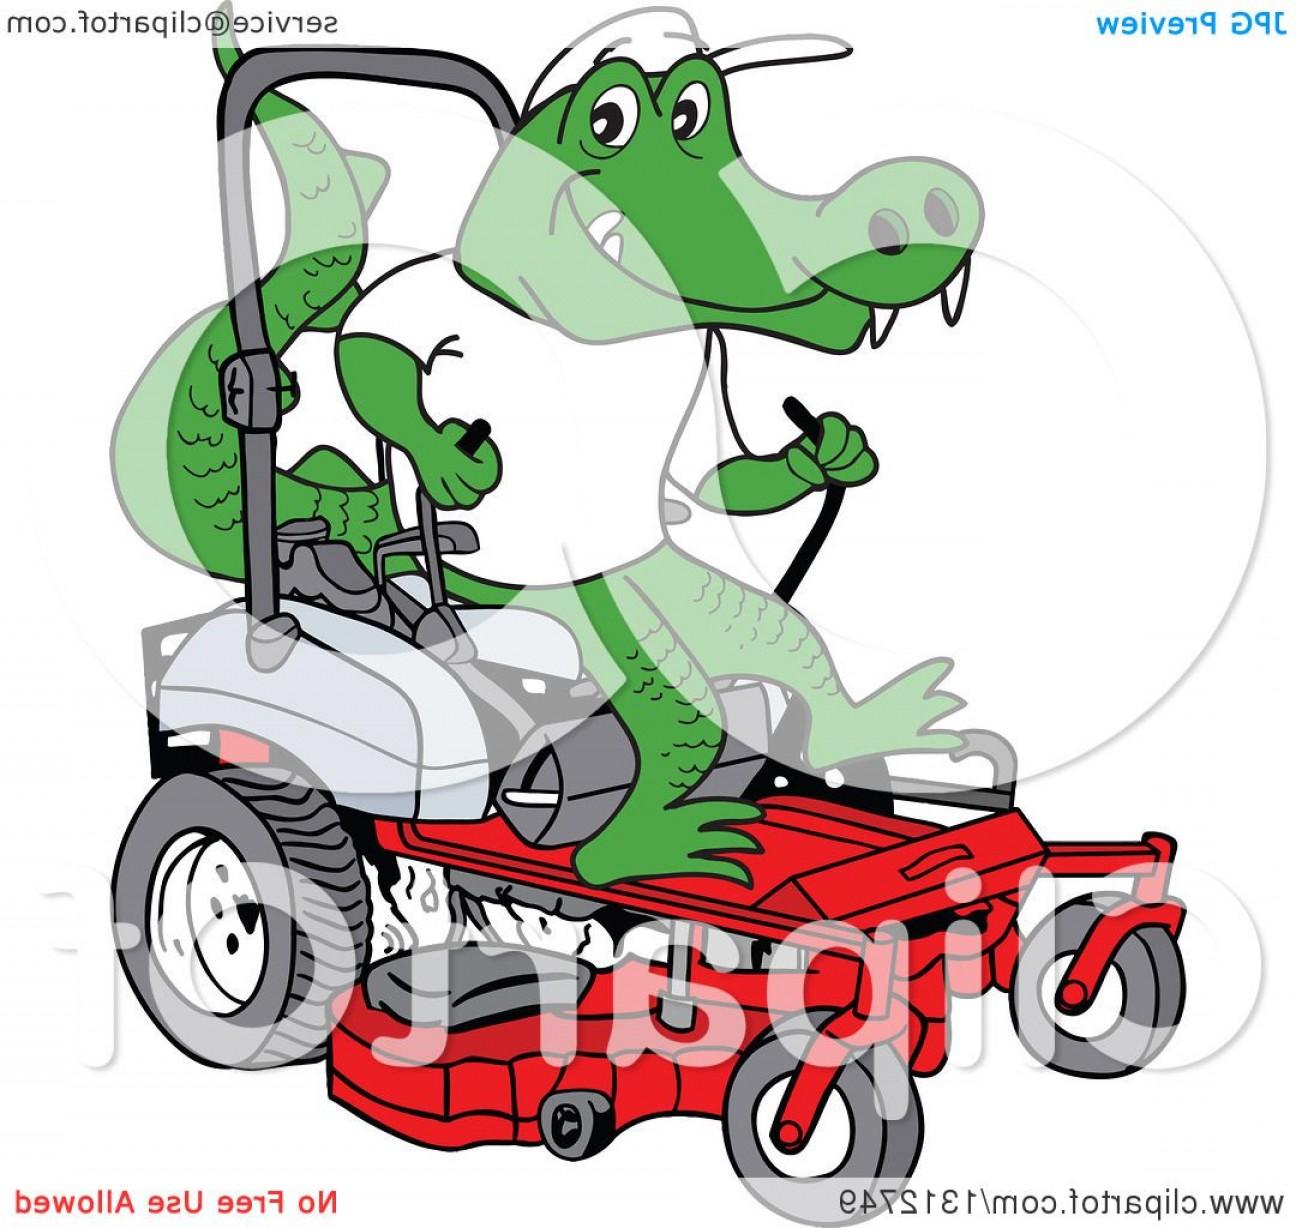 1296x1228 Cartoon Alligator Operating A Red Riding Lawn Mower Shopatcloth